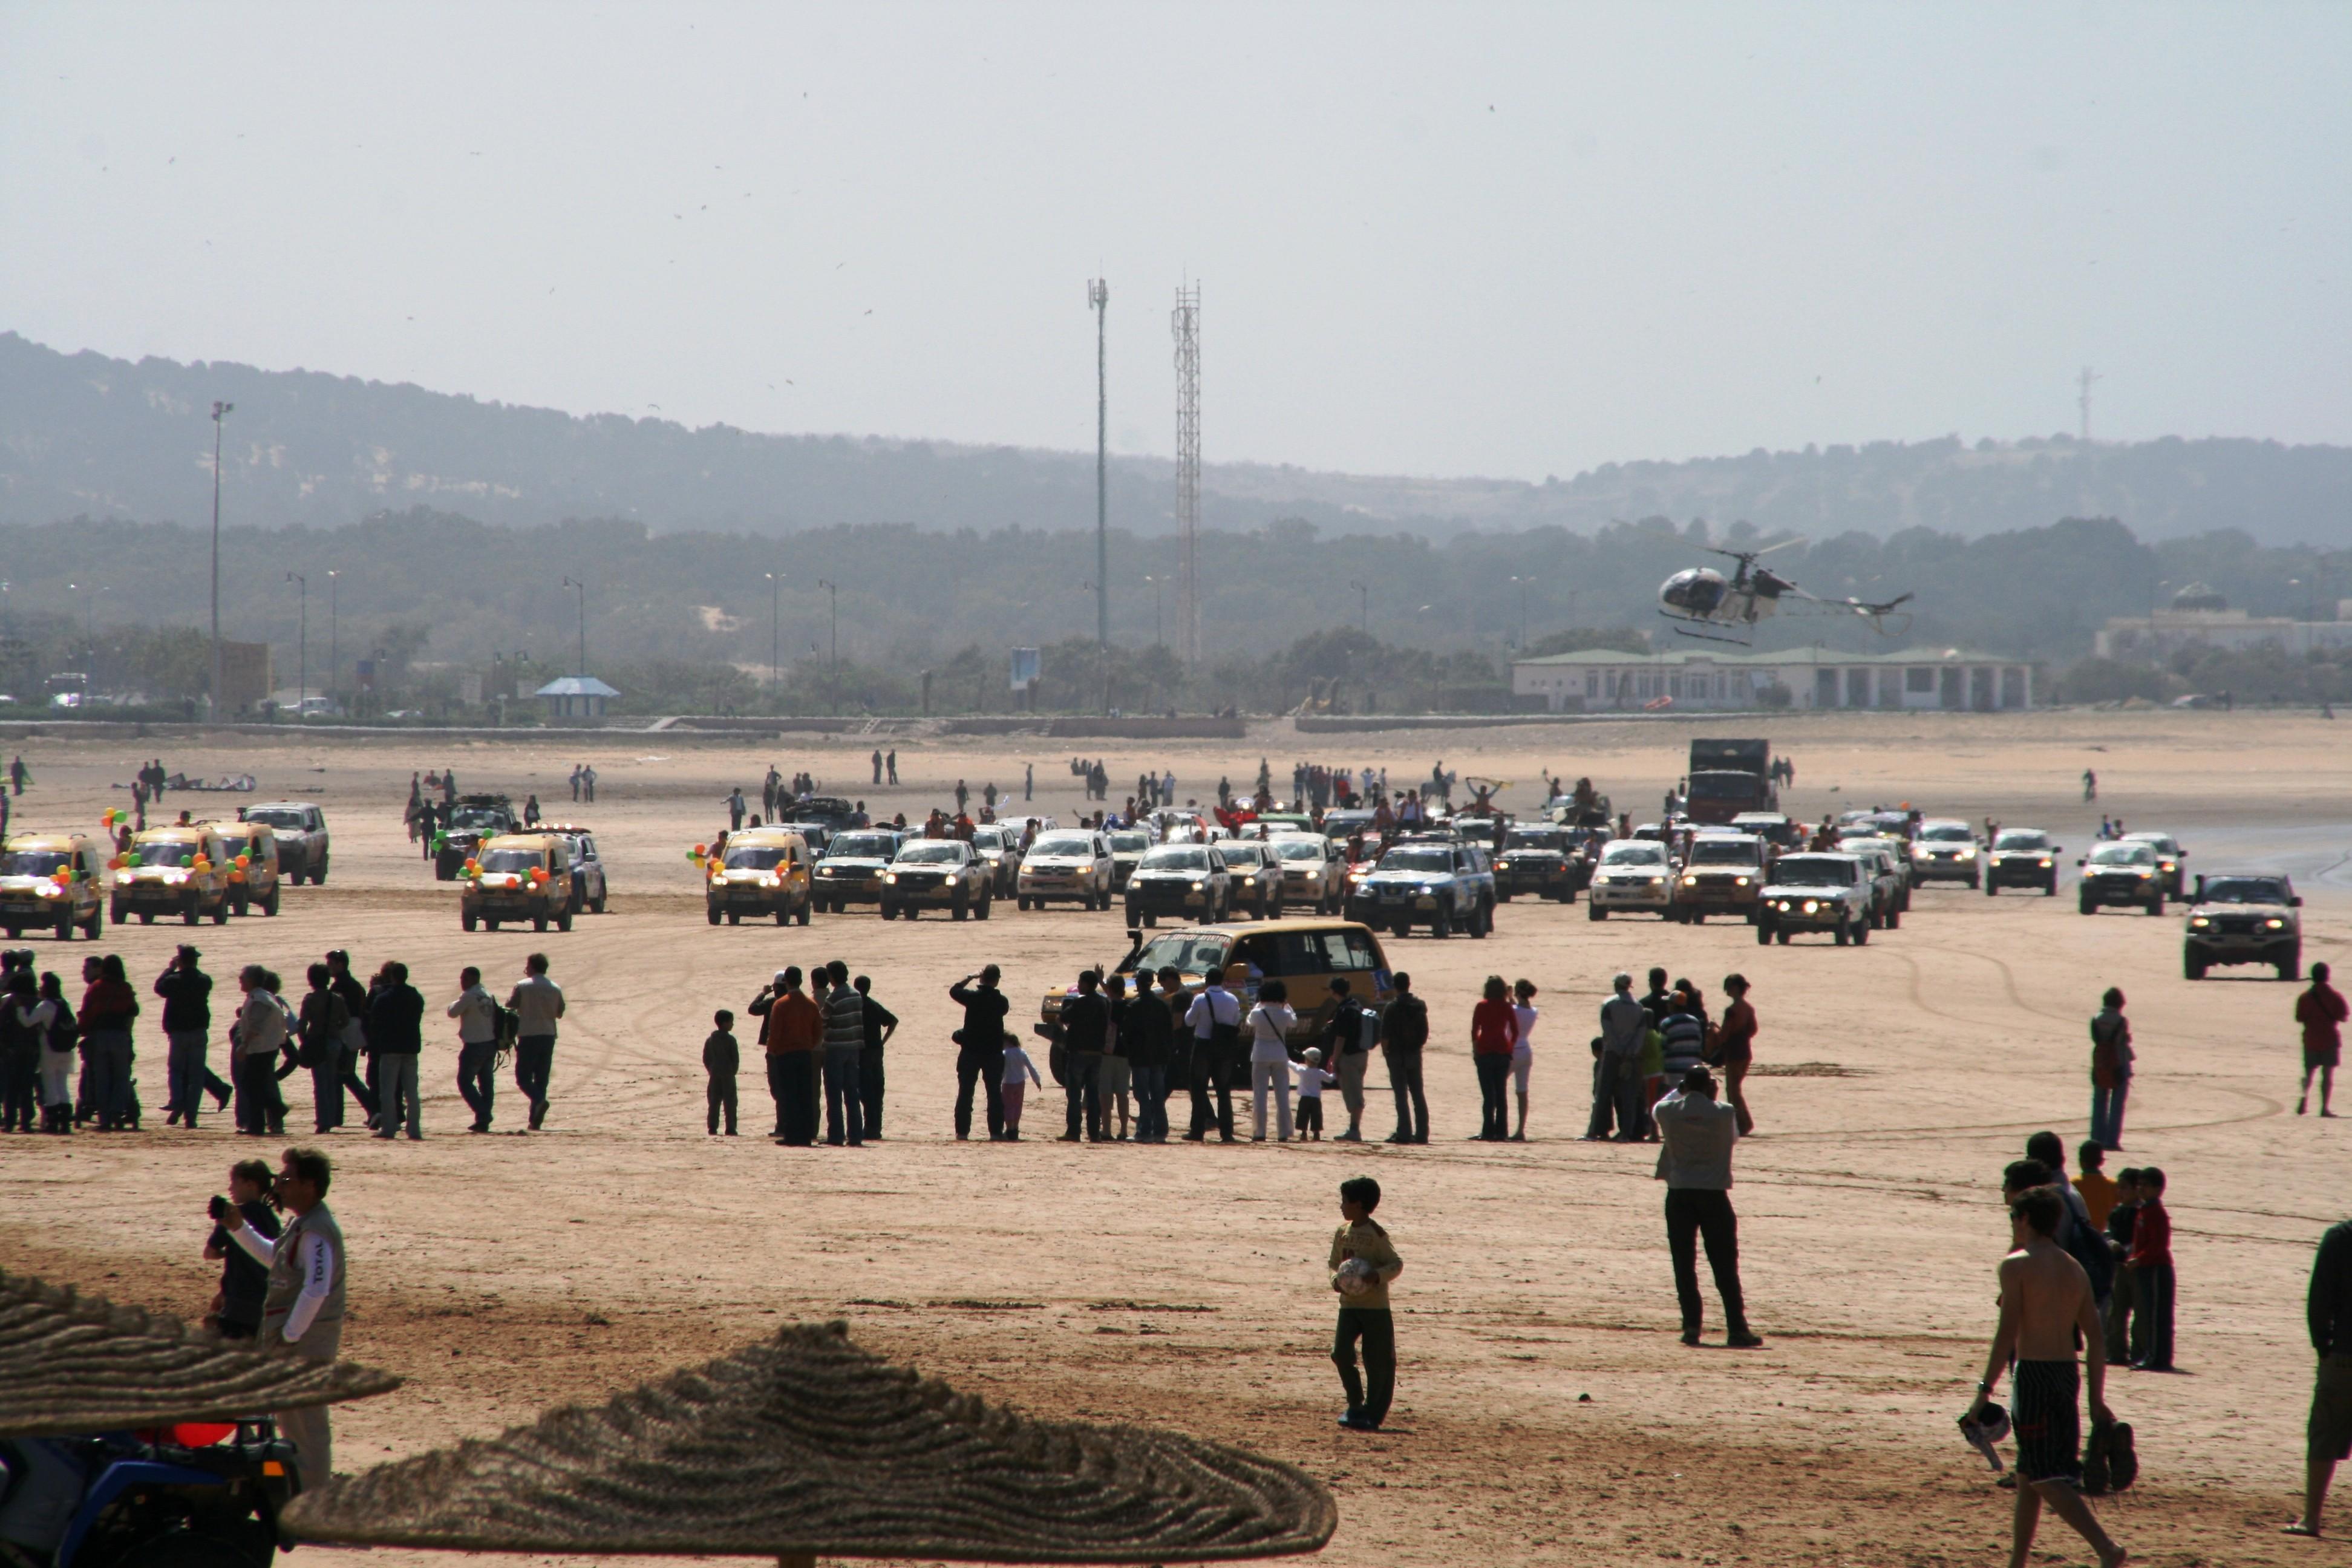 De Rallye Gazelles des Aicha eindigt op het strand van Essaouira